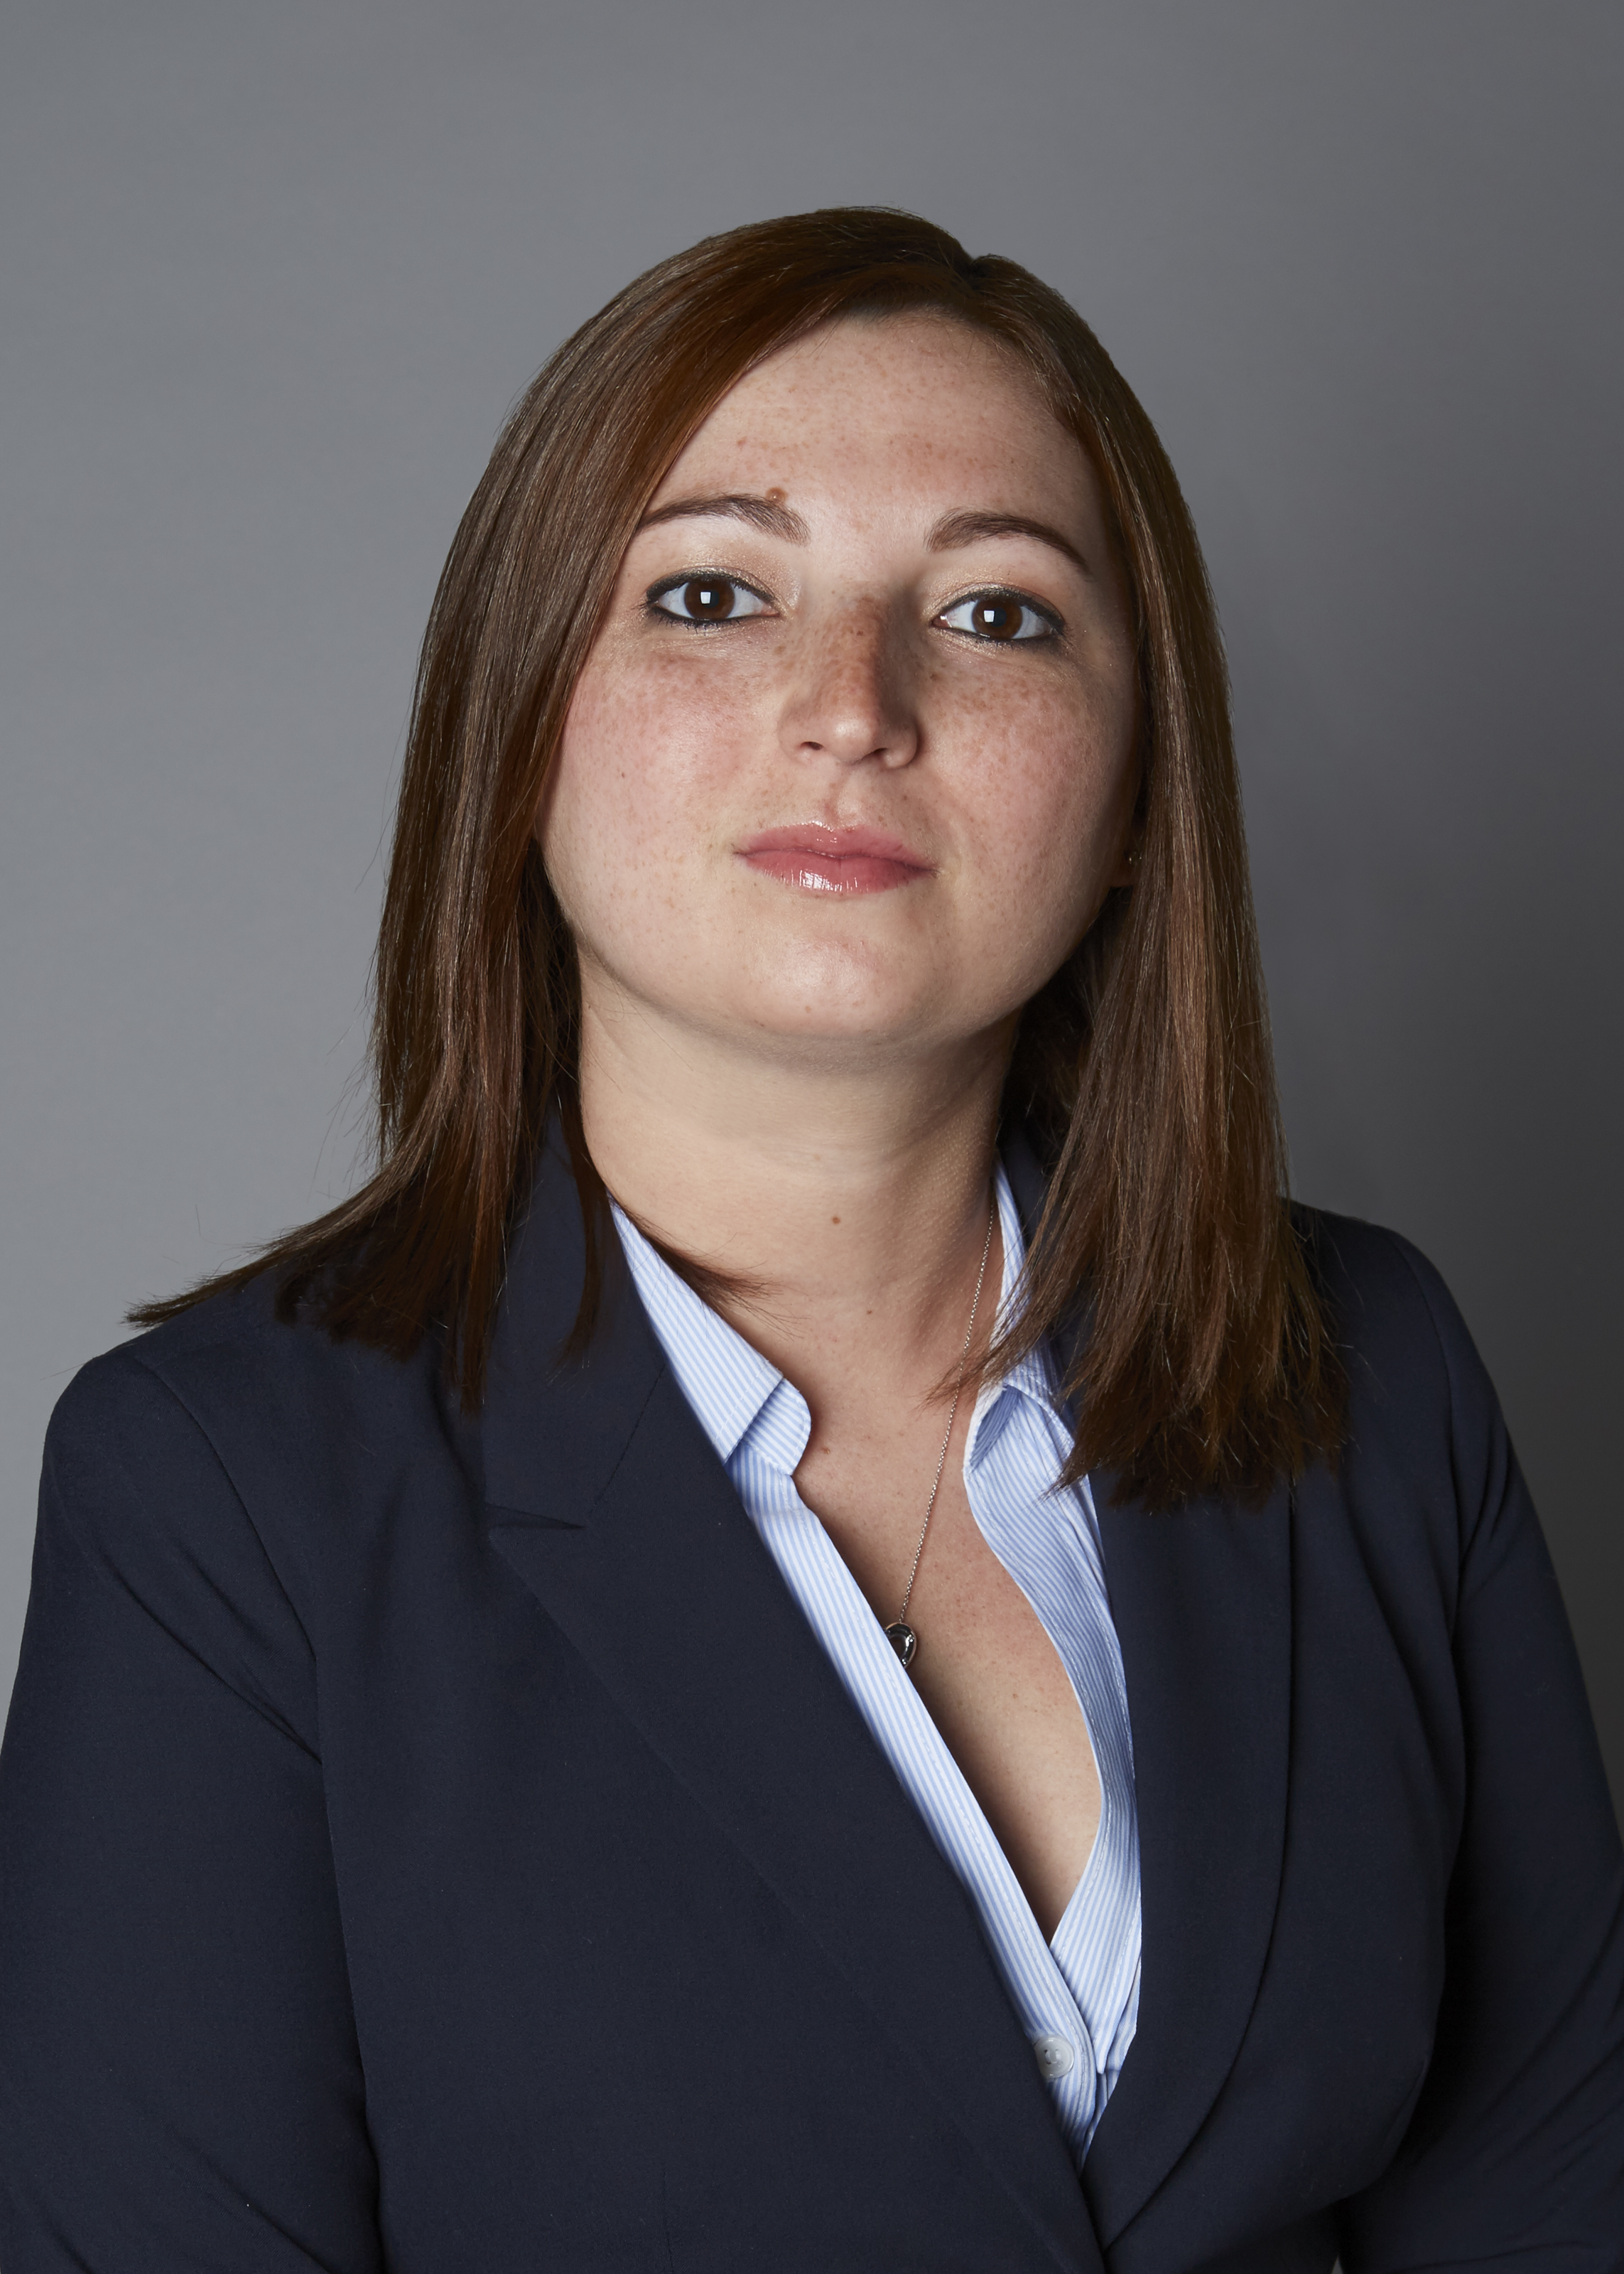 Headshot of Margarita Bachman